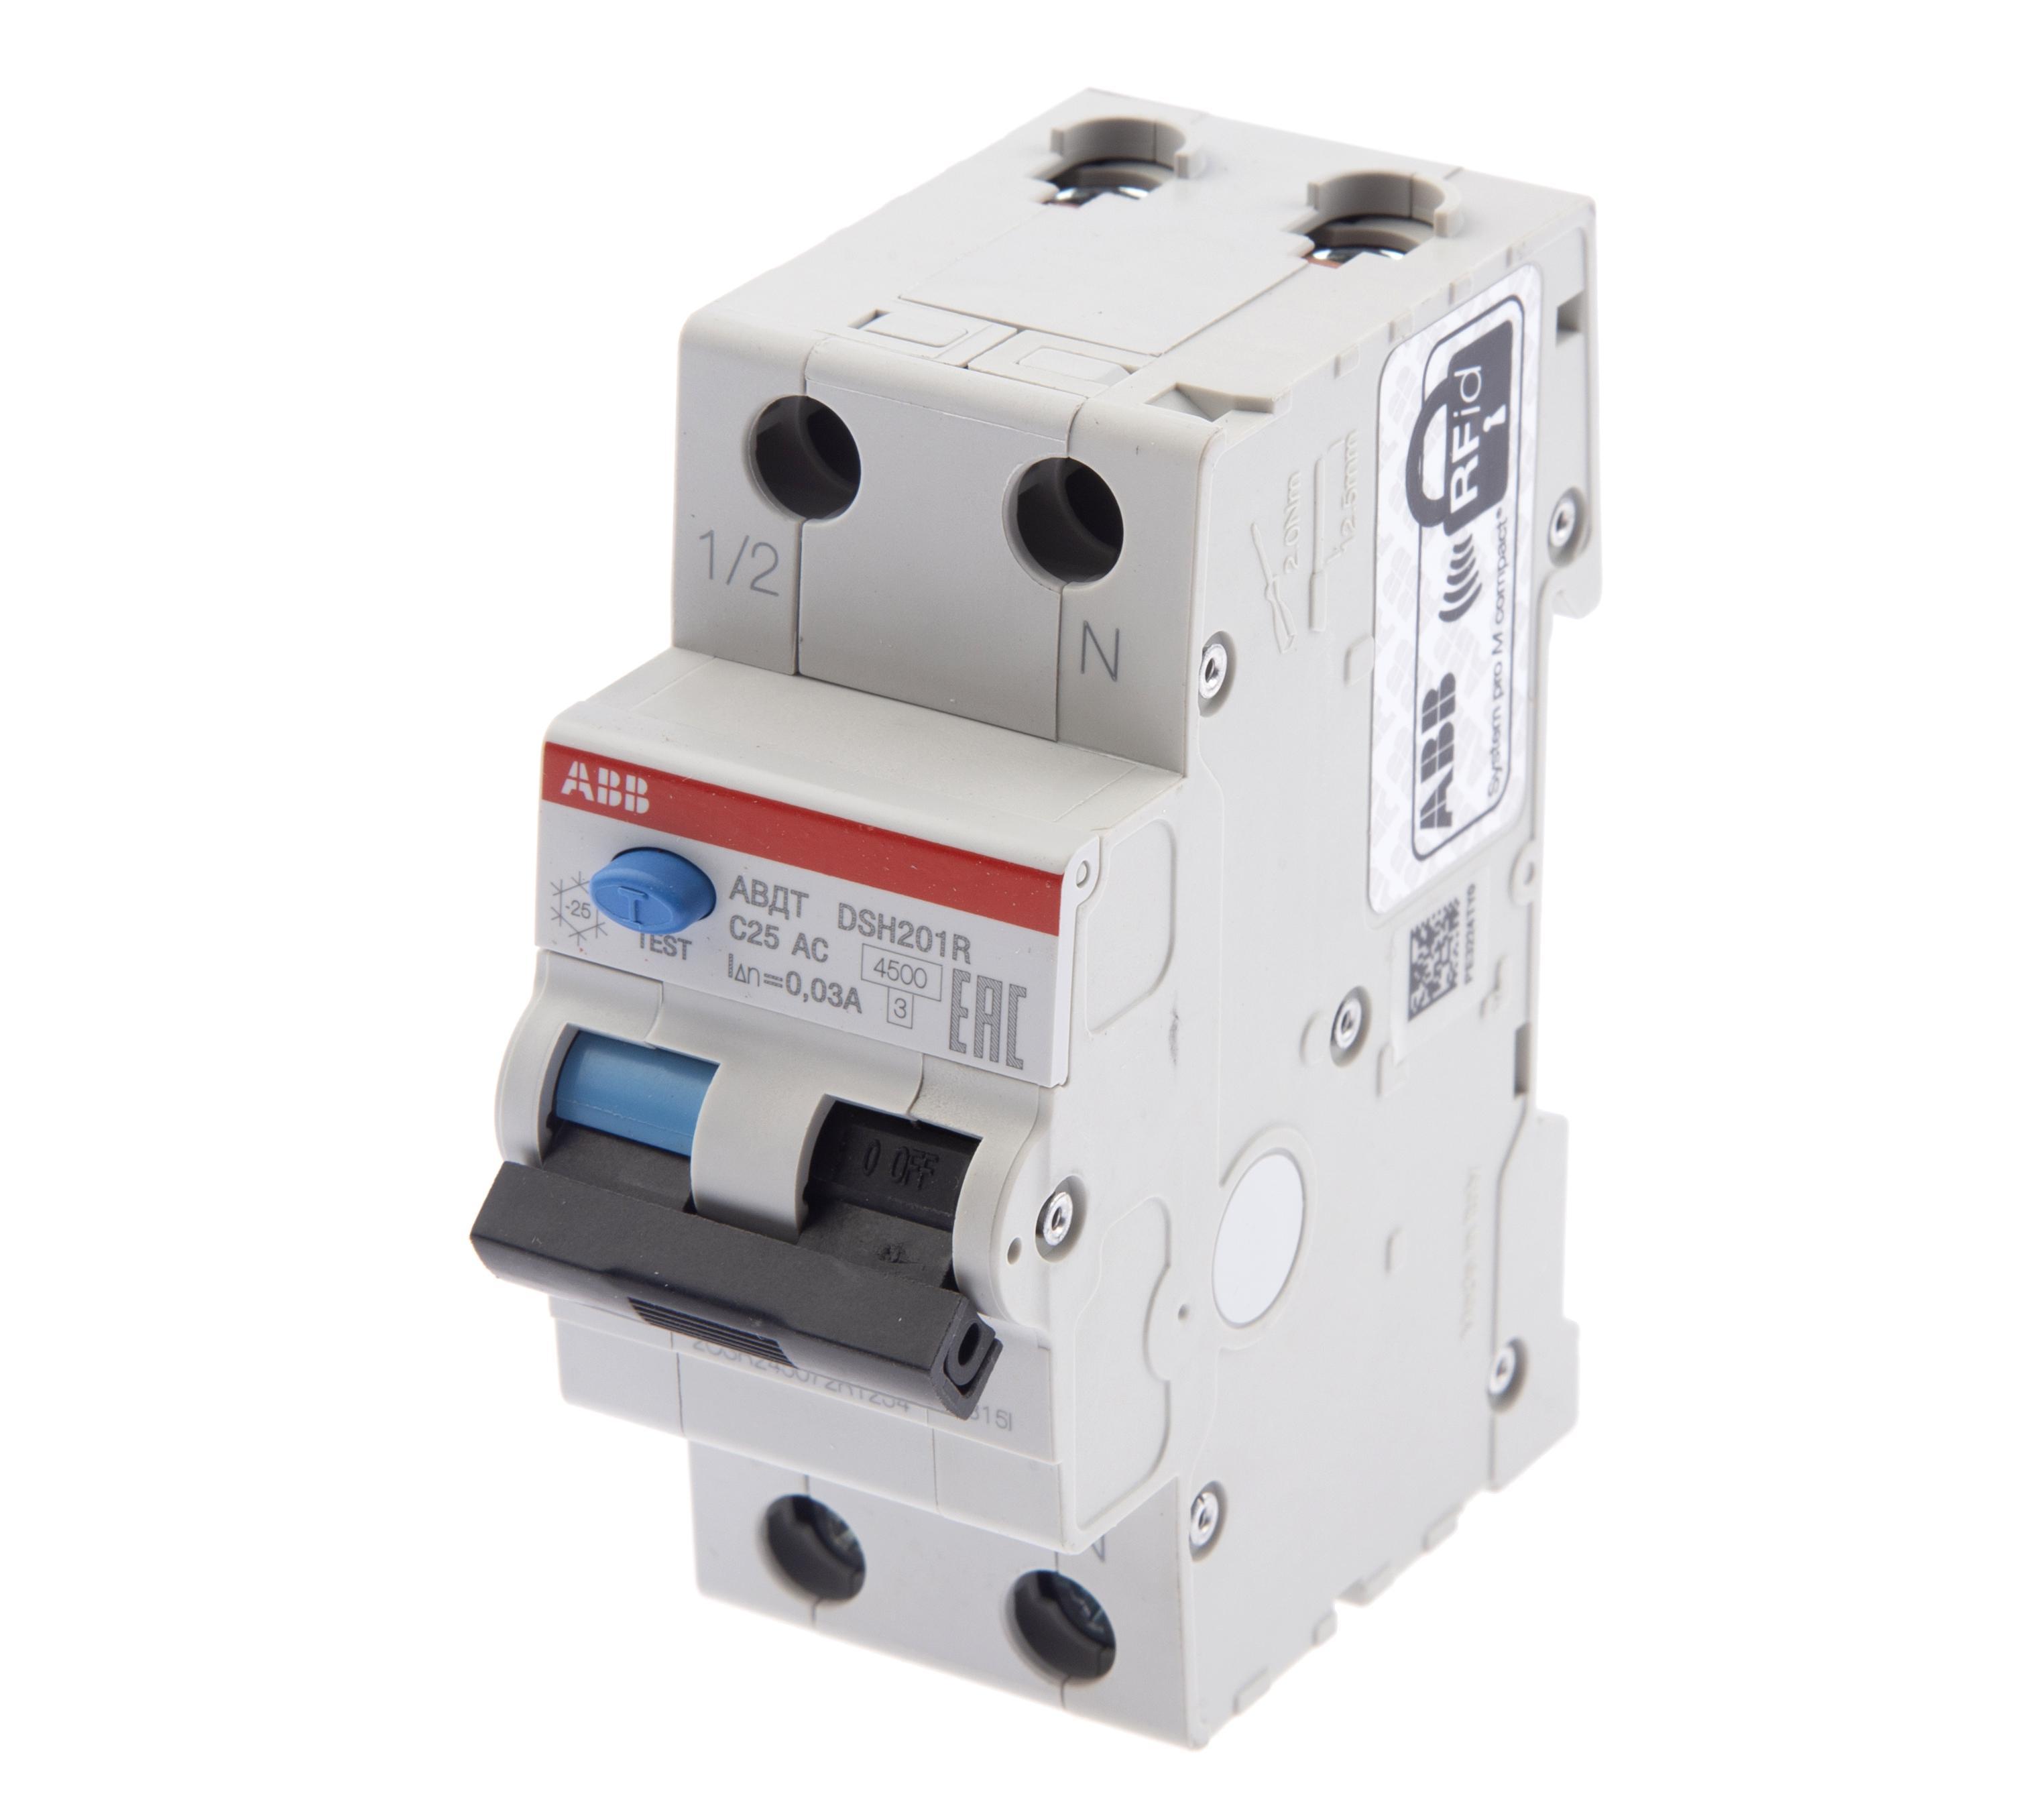 Диф. автомат Abb Dsh941r c25 дифференциальный автомат 1p n 25а тип c 30 ма 4 5 ka abb dsh941r